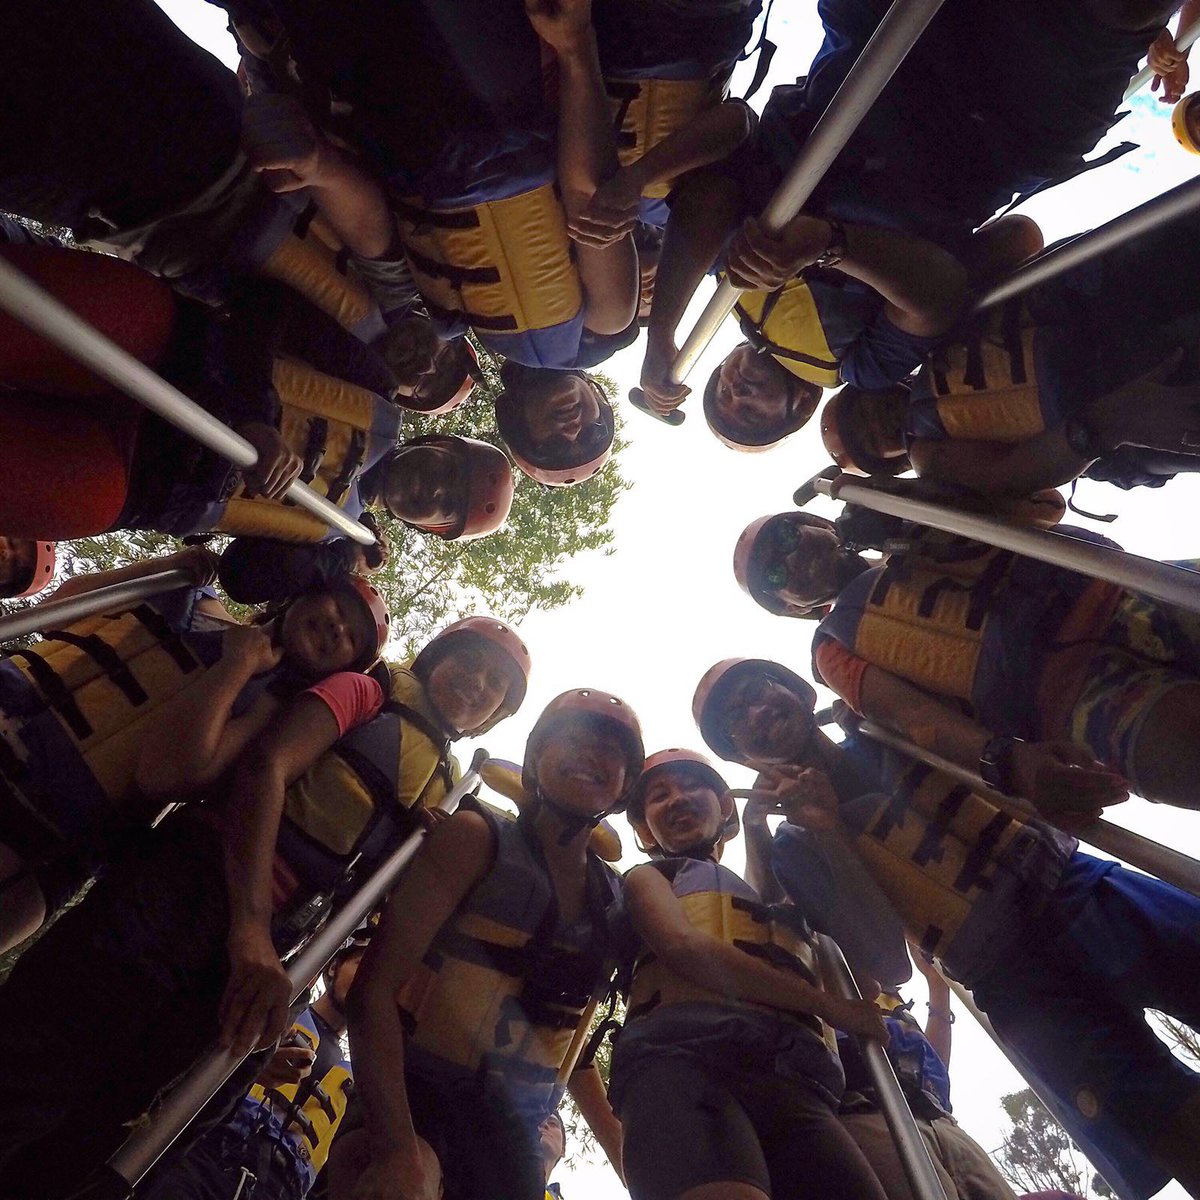 Selesai melihat air terjun Bedegung langsung menjajal Enim Rafting yang hari ini di level 3-4 #pesonasriwijaya https://t.co/VUTMHBVlpG